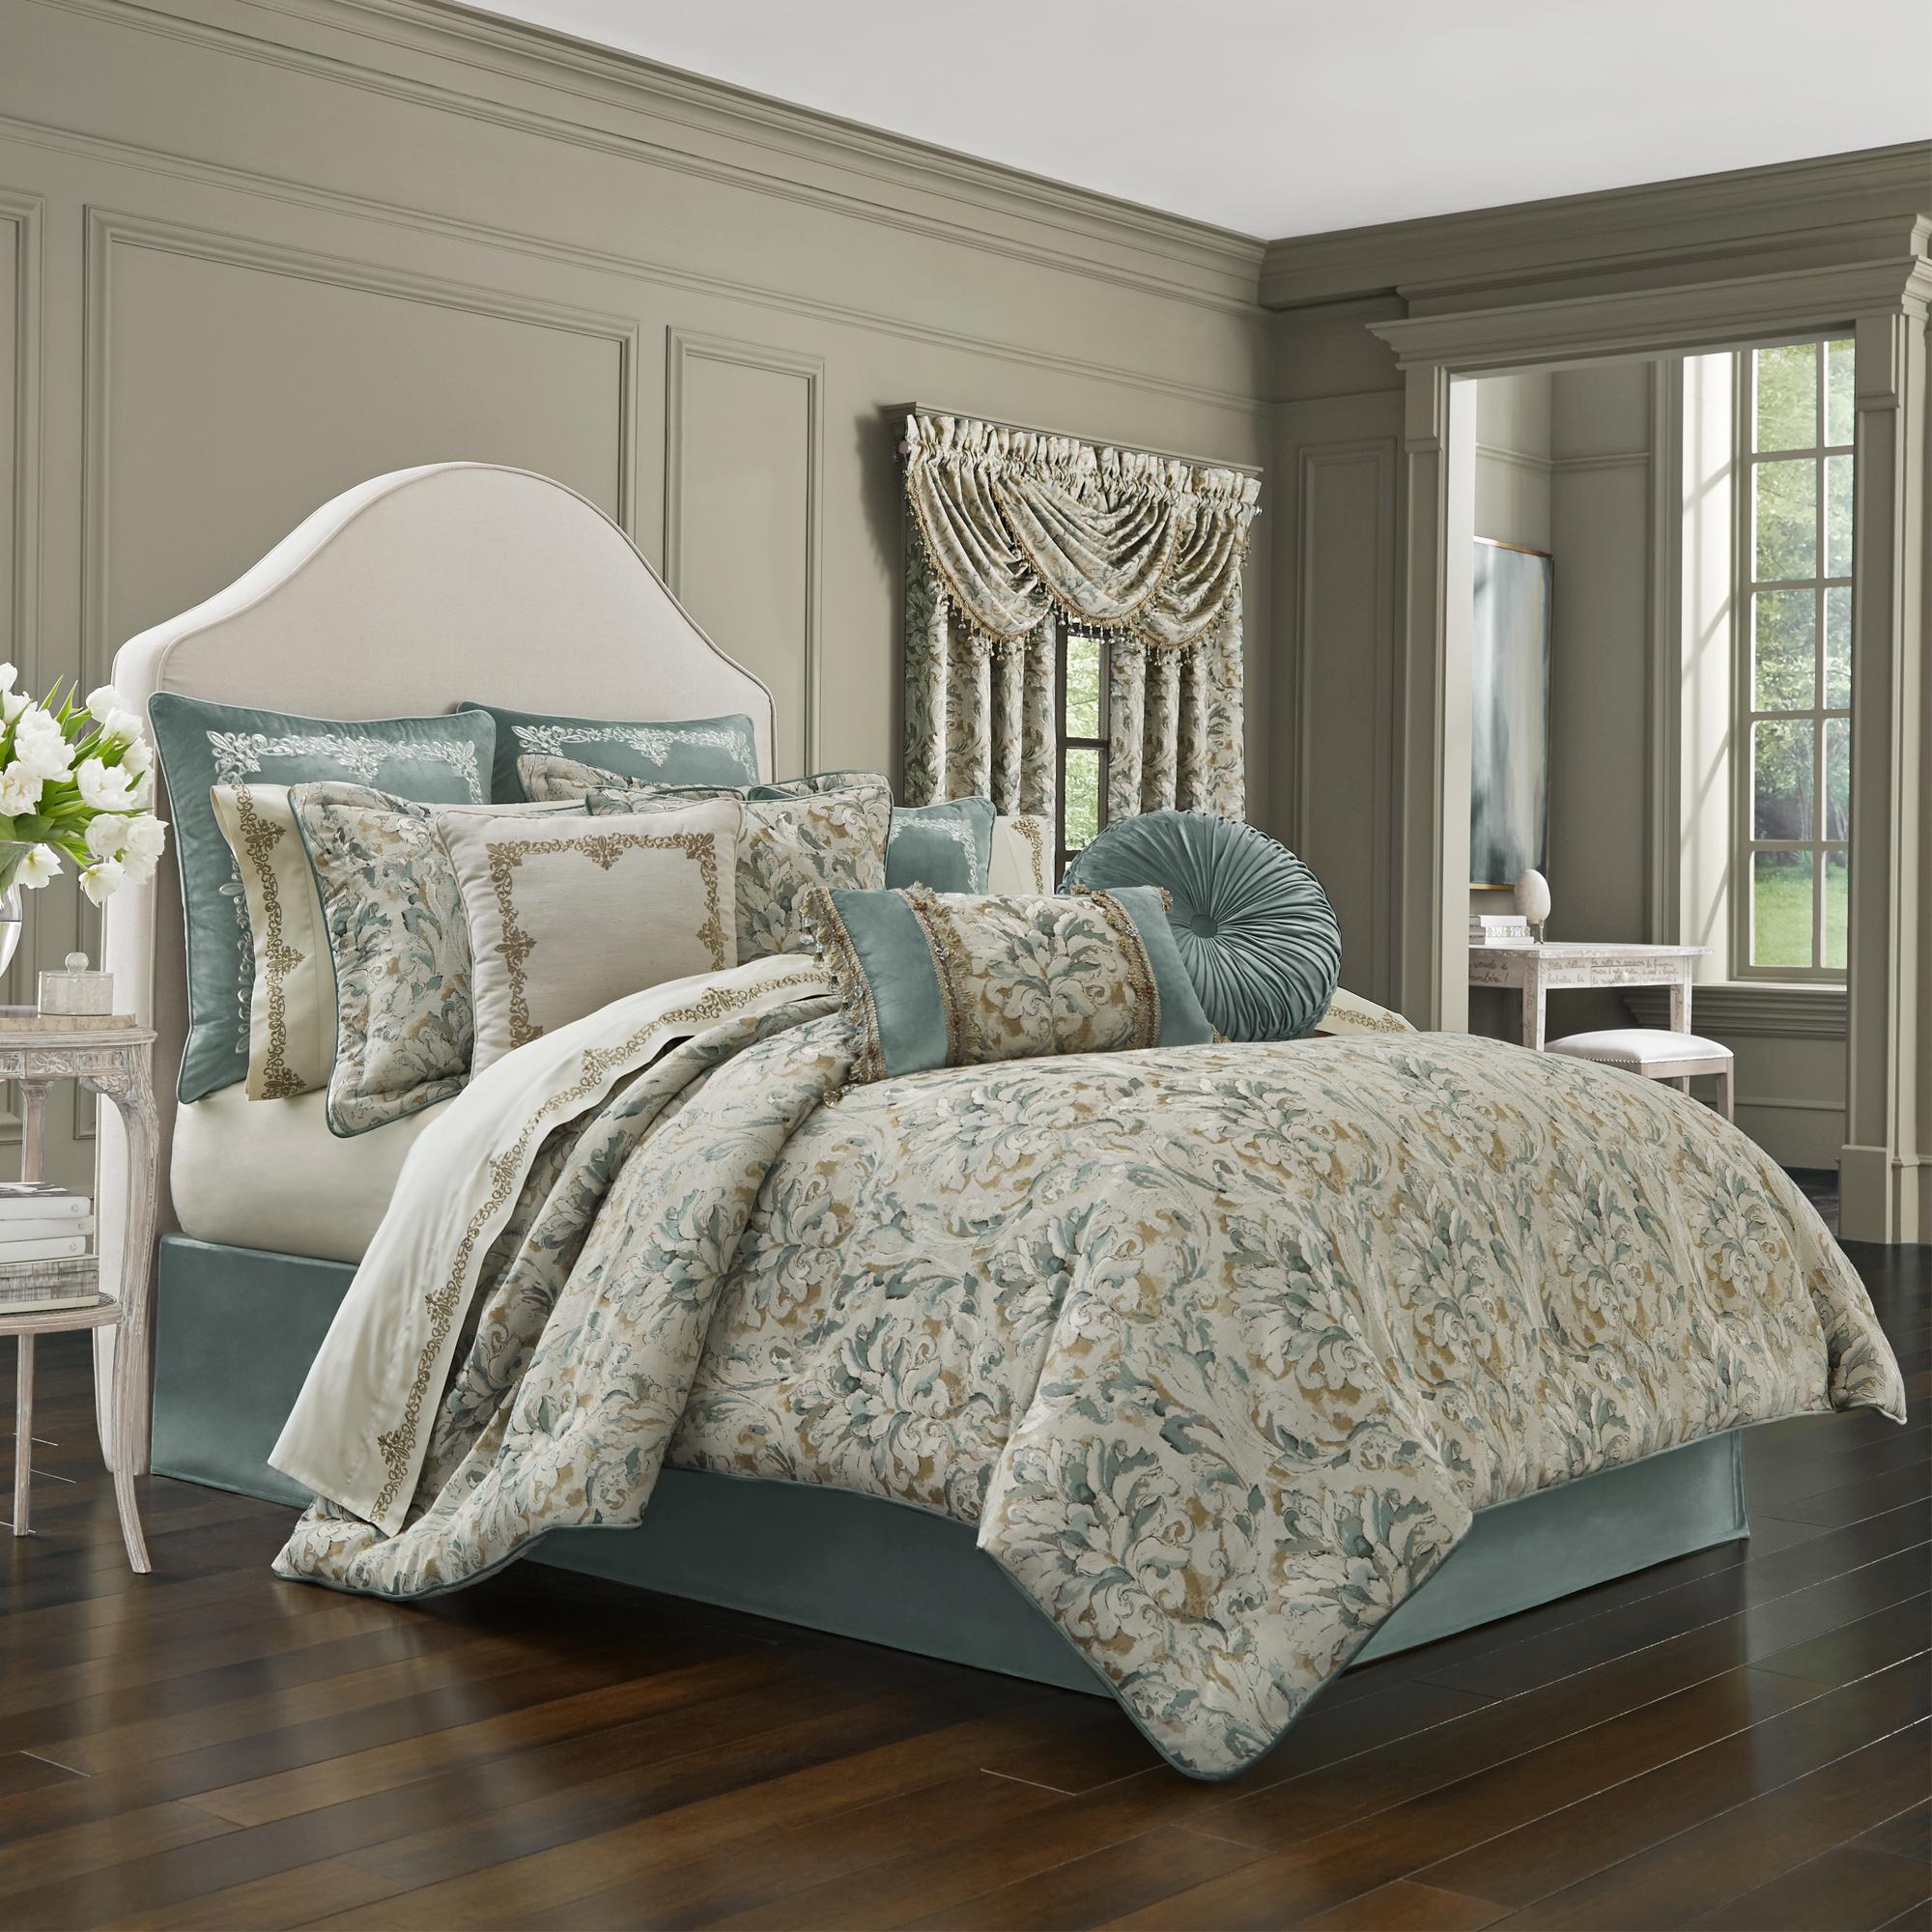 Donatella 4 Piece Comforter Set